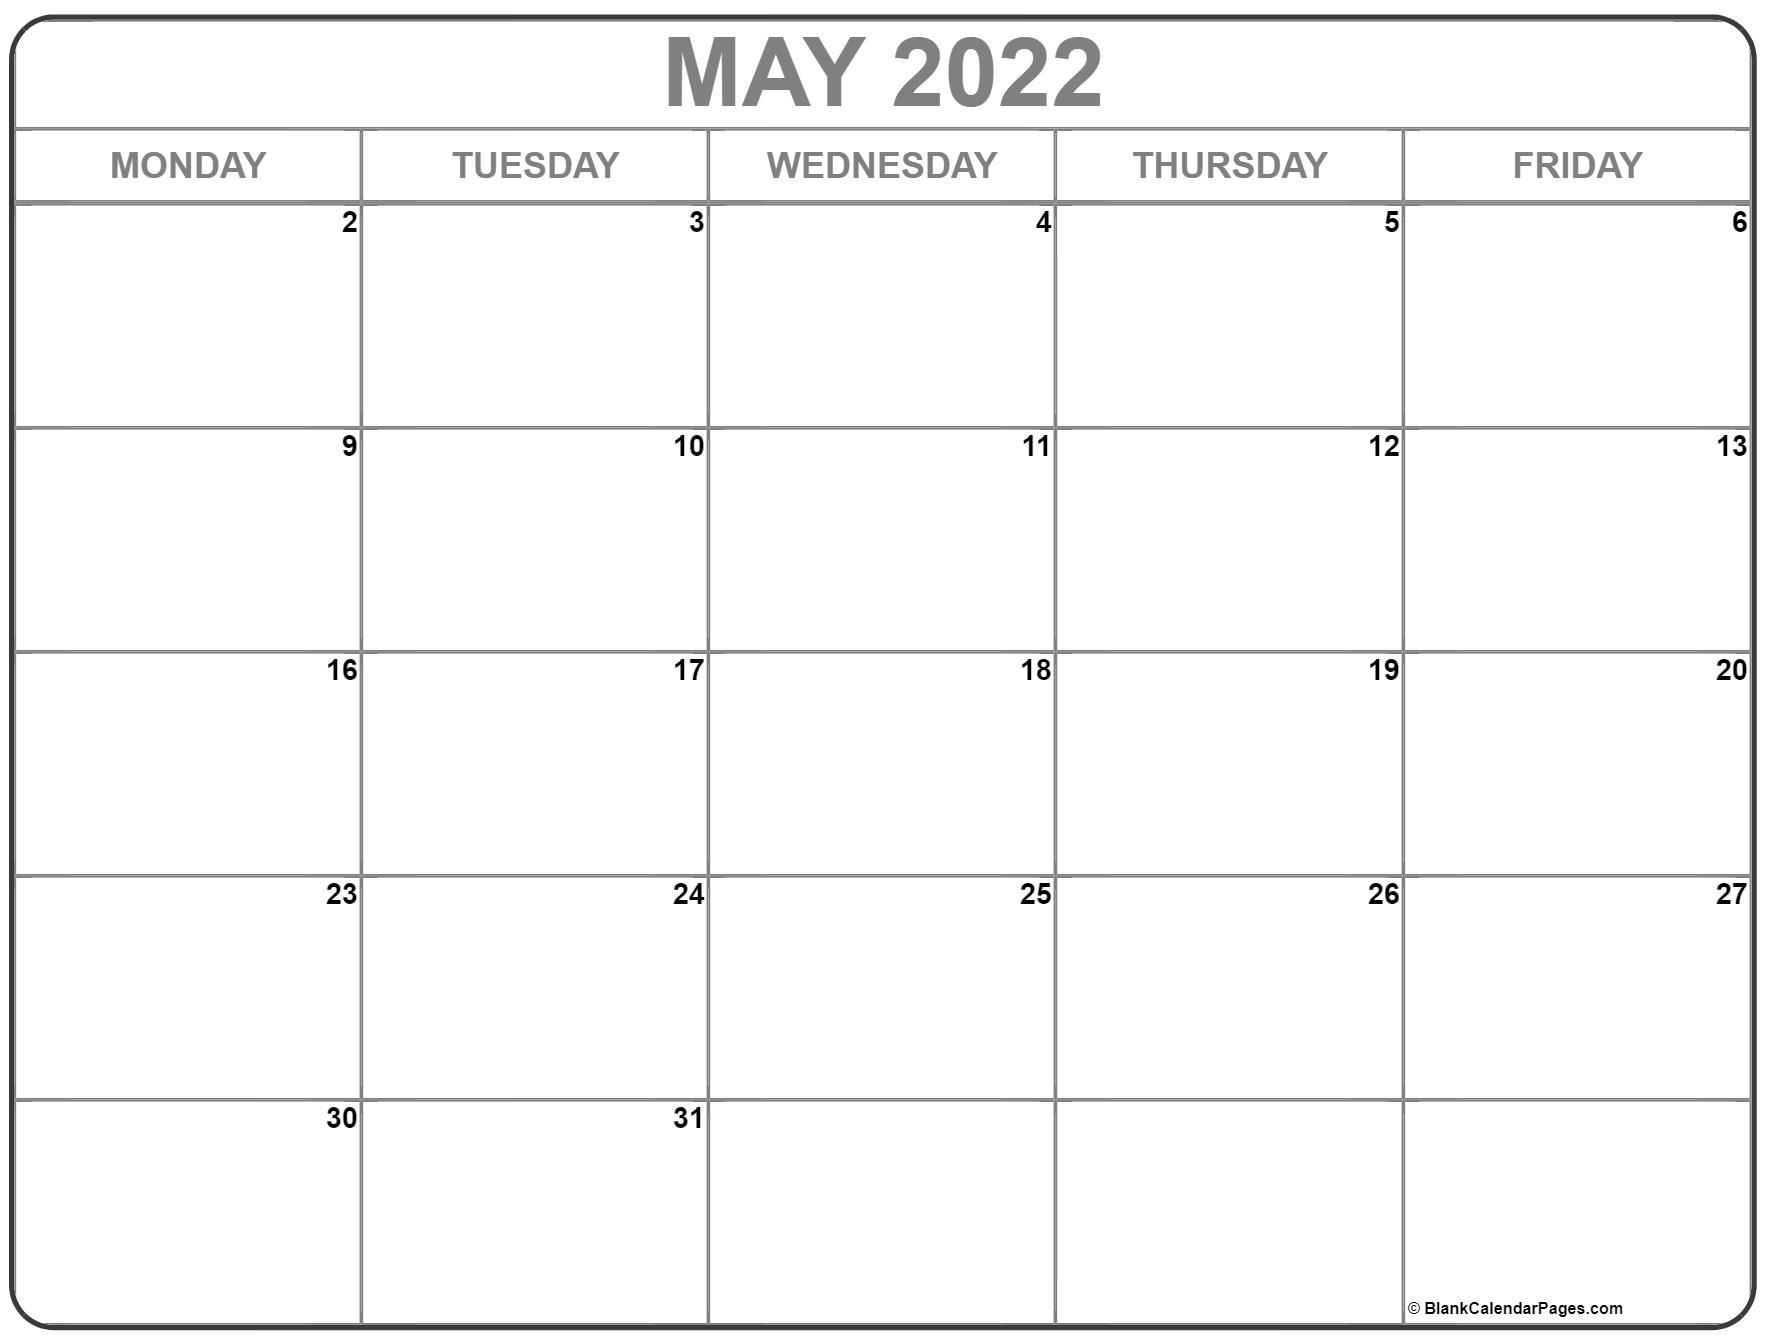 May 2022 Monday Calendar   Monday To Sunday Free Printable Calendar Mon To Fri